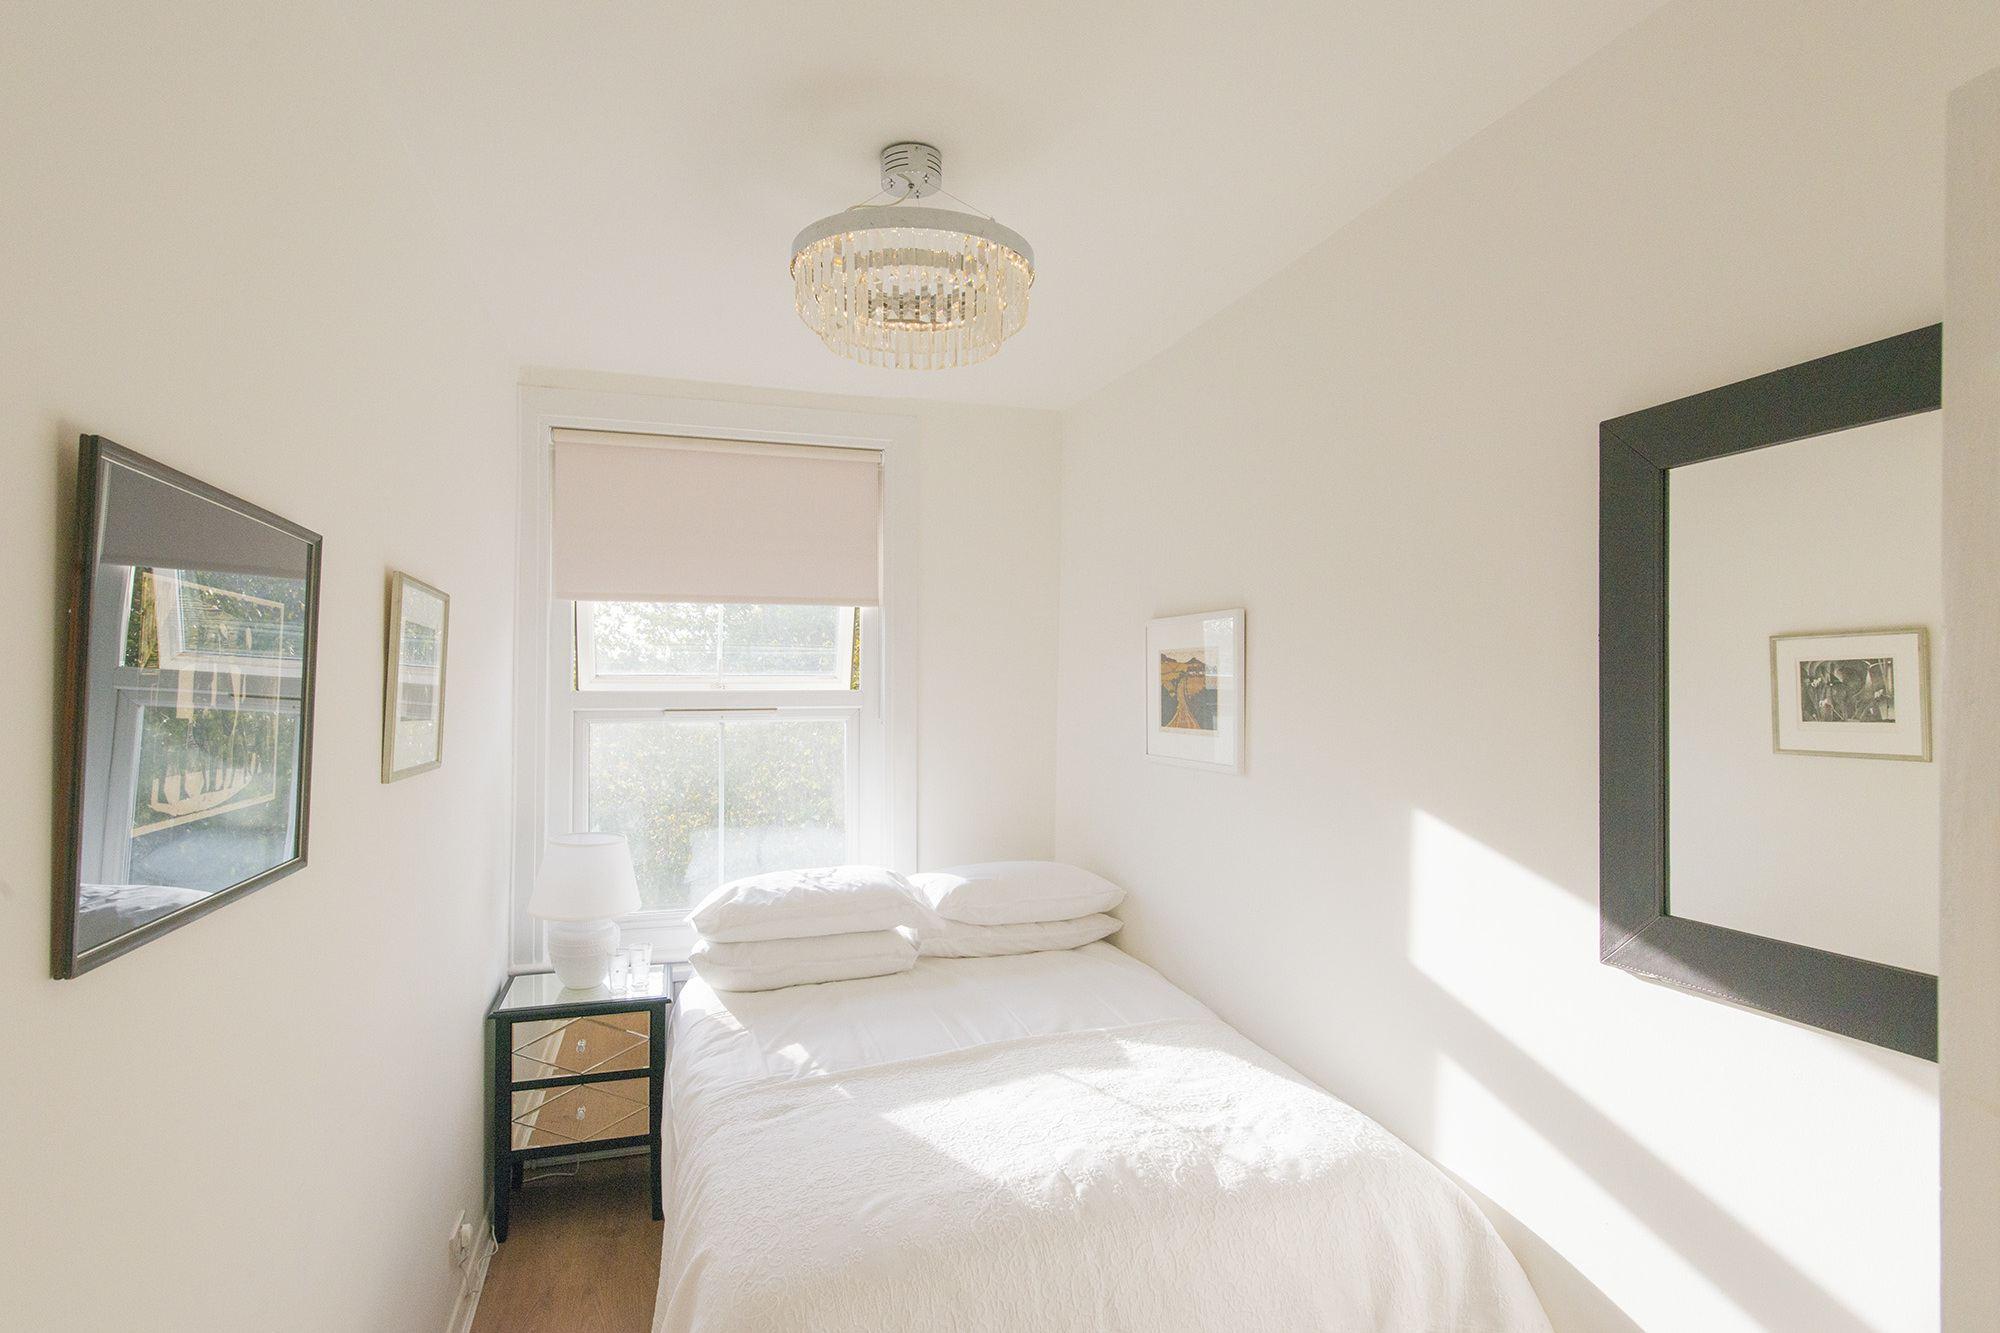 Bedroom201.jpg